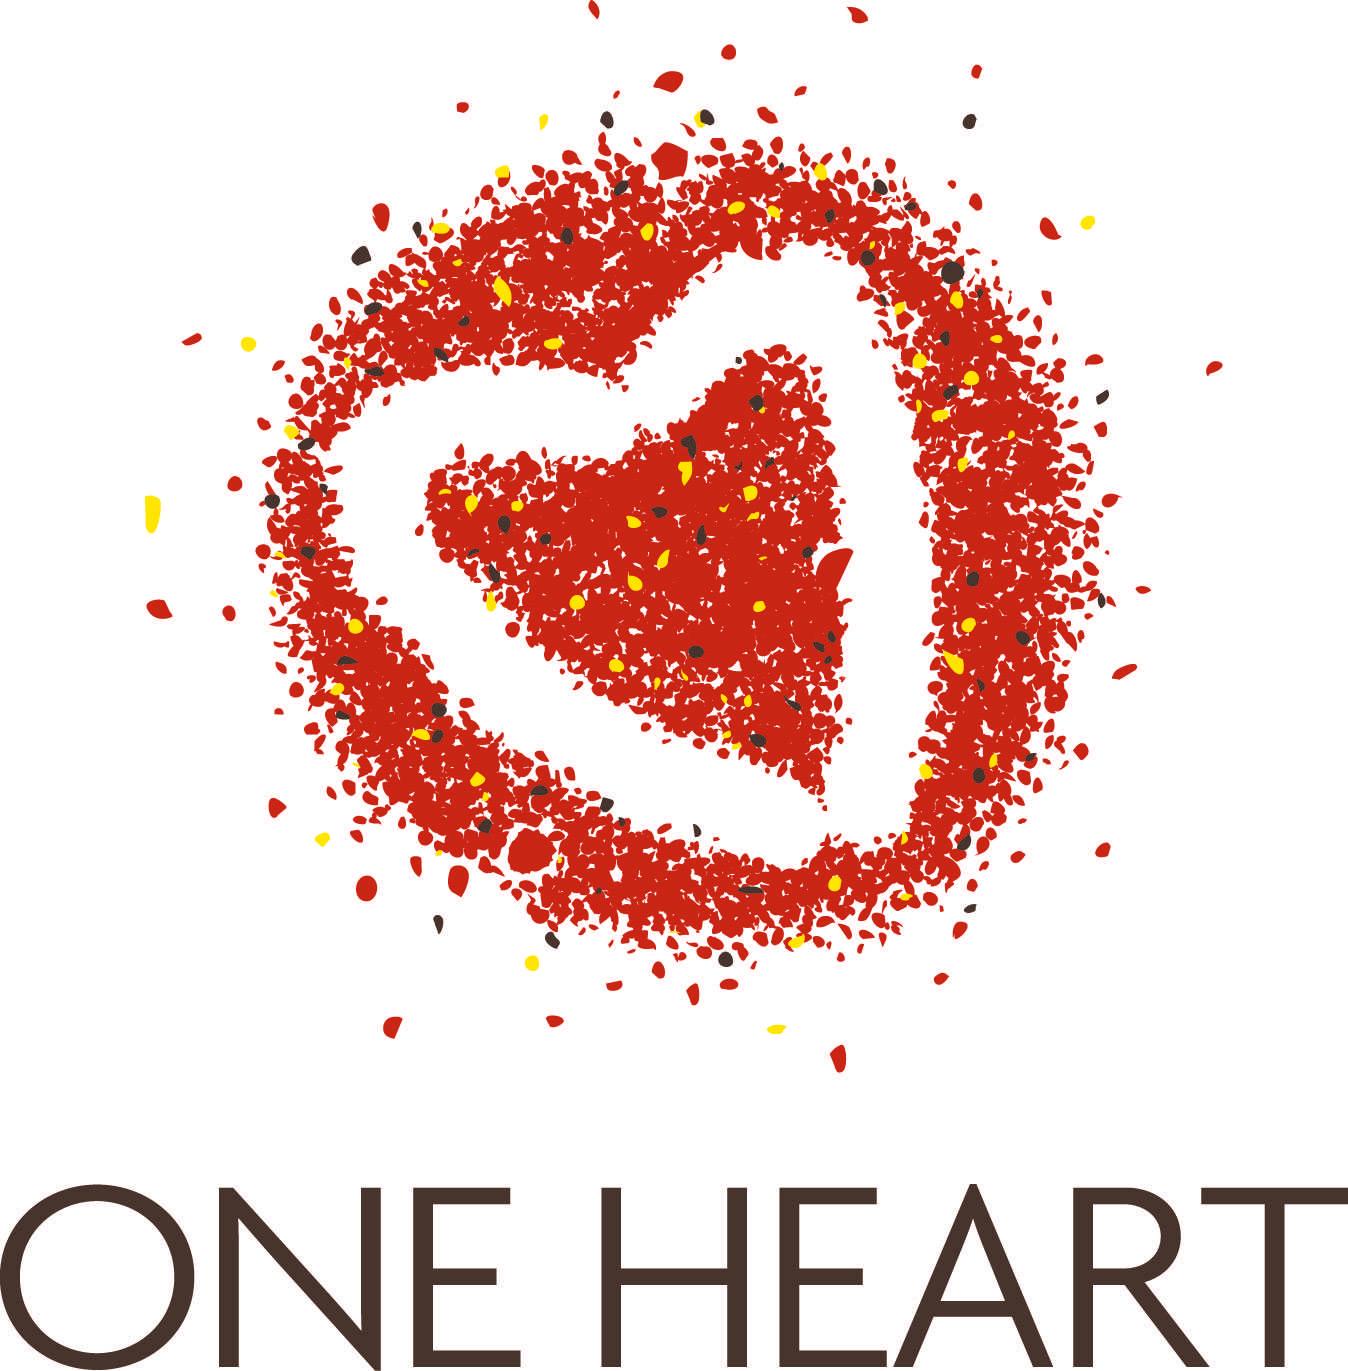 One heart logo